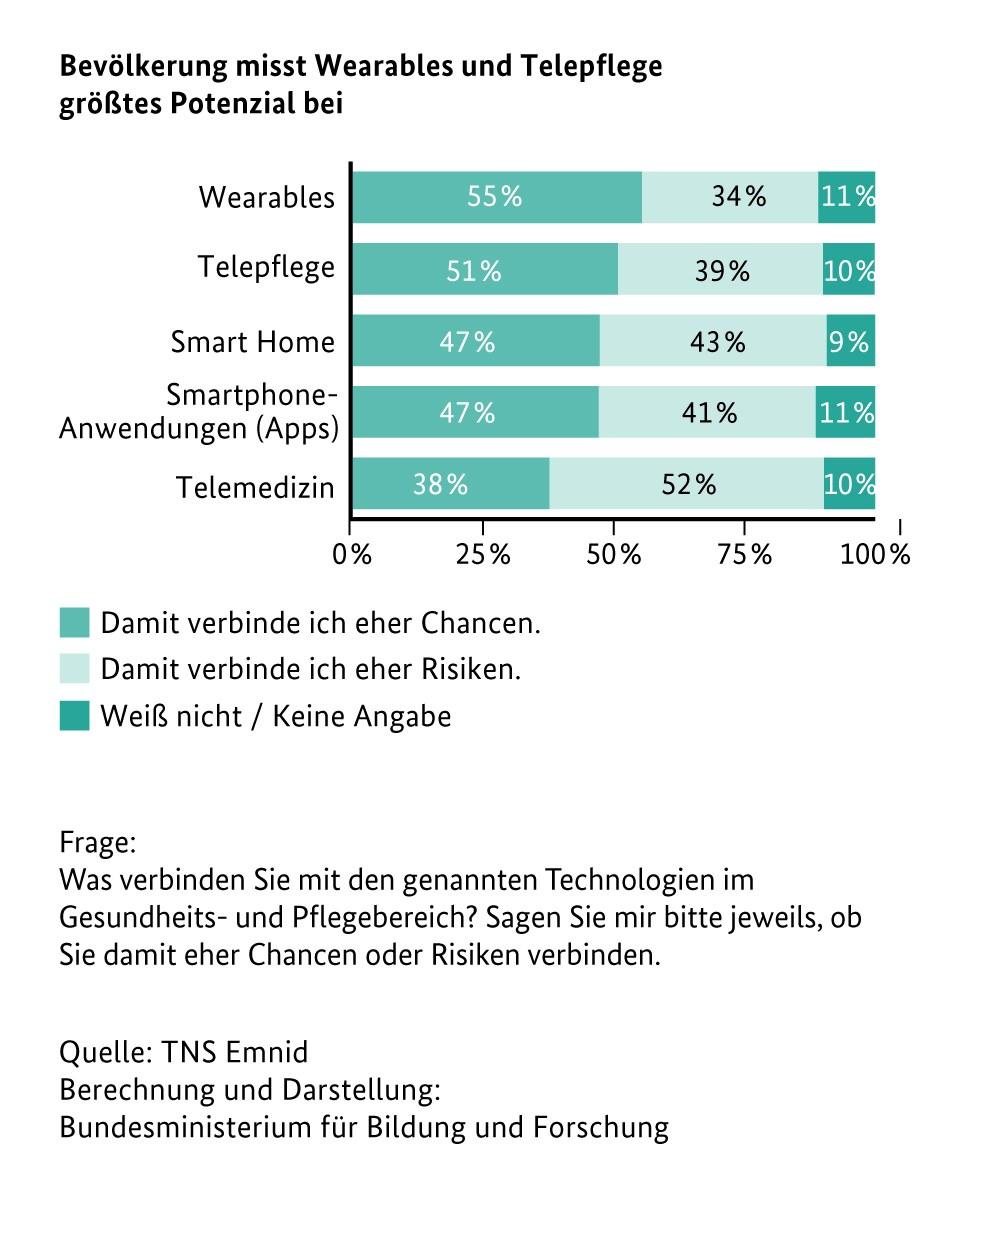 grafik tns emnid bmbf wearable telepflege smart home